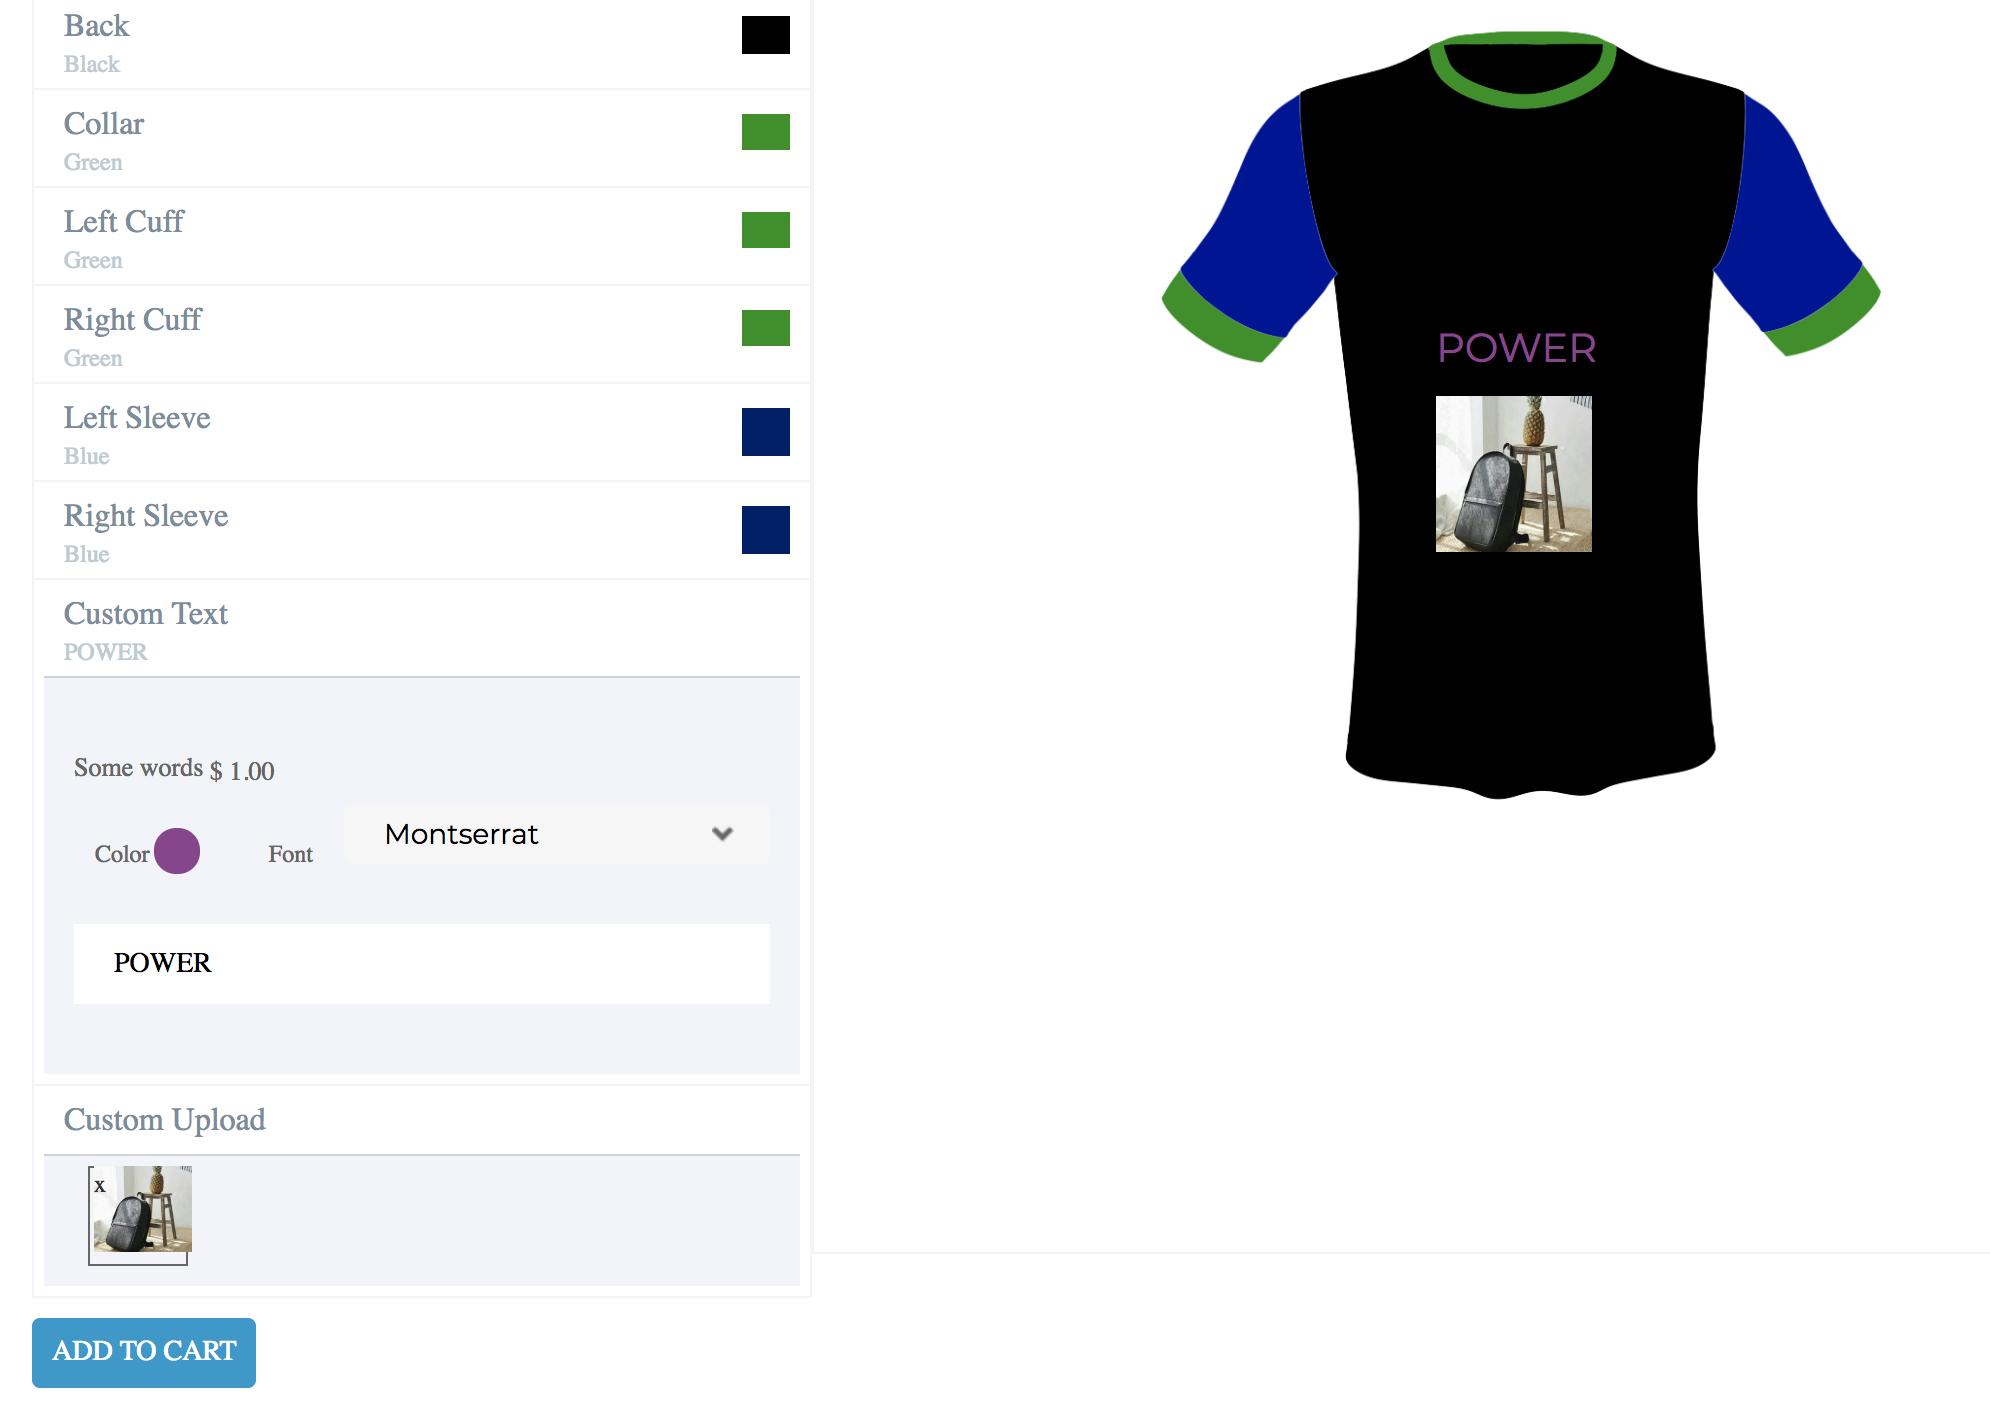 custom t-shirts and jerseys